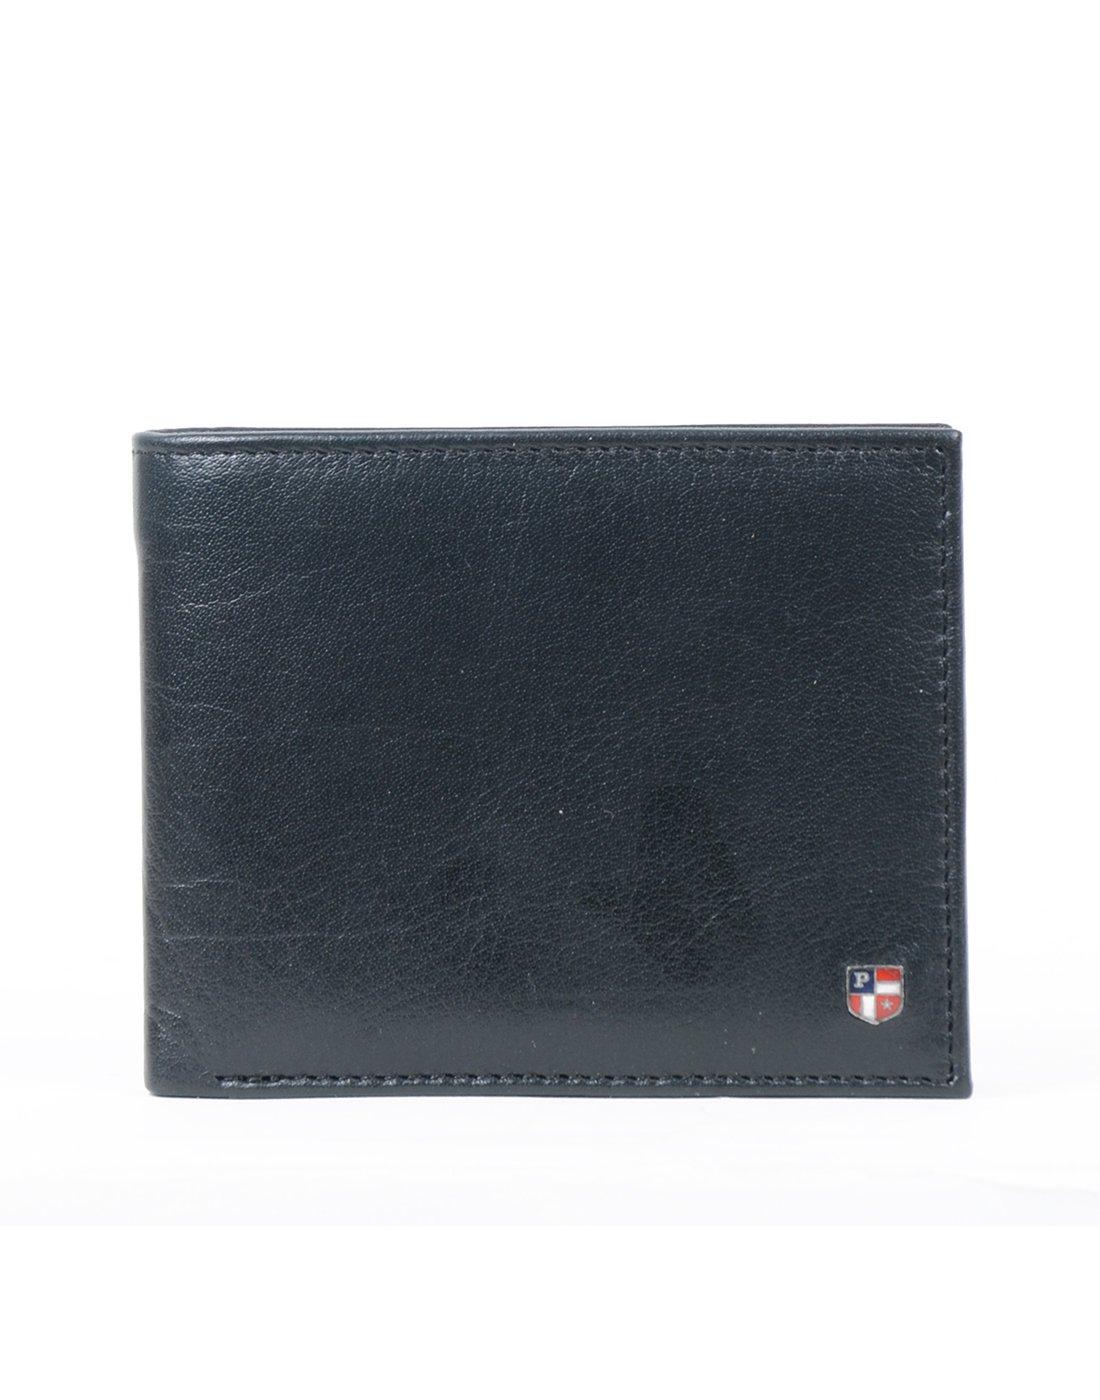 U.S.POLO.ASSN. Black Men's Wallet (USAW0505)